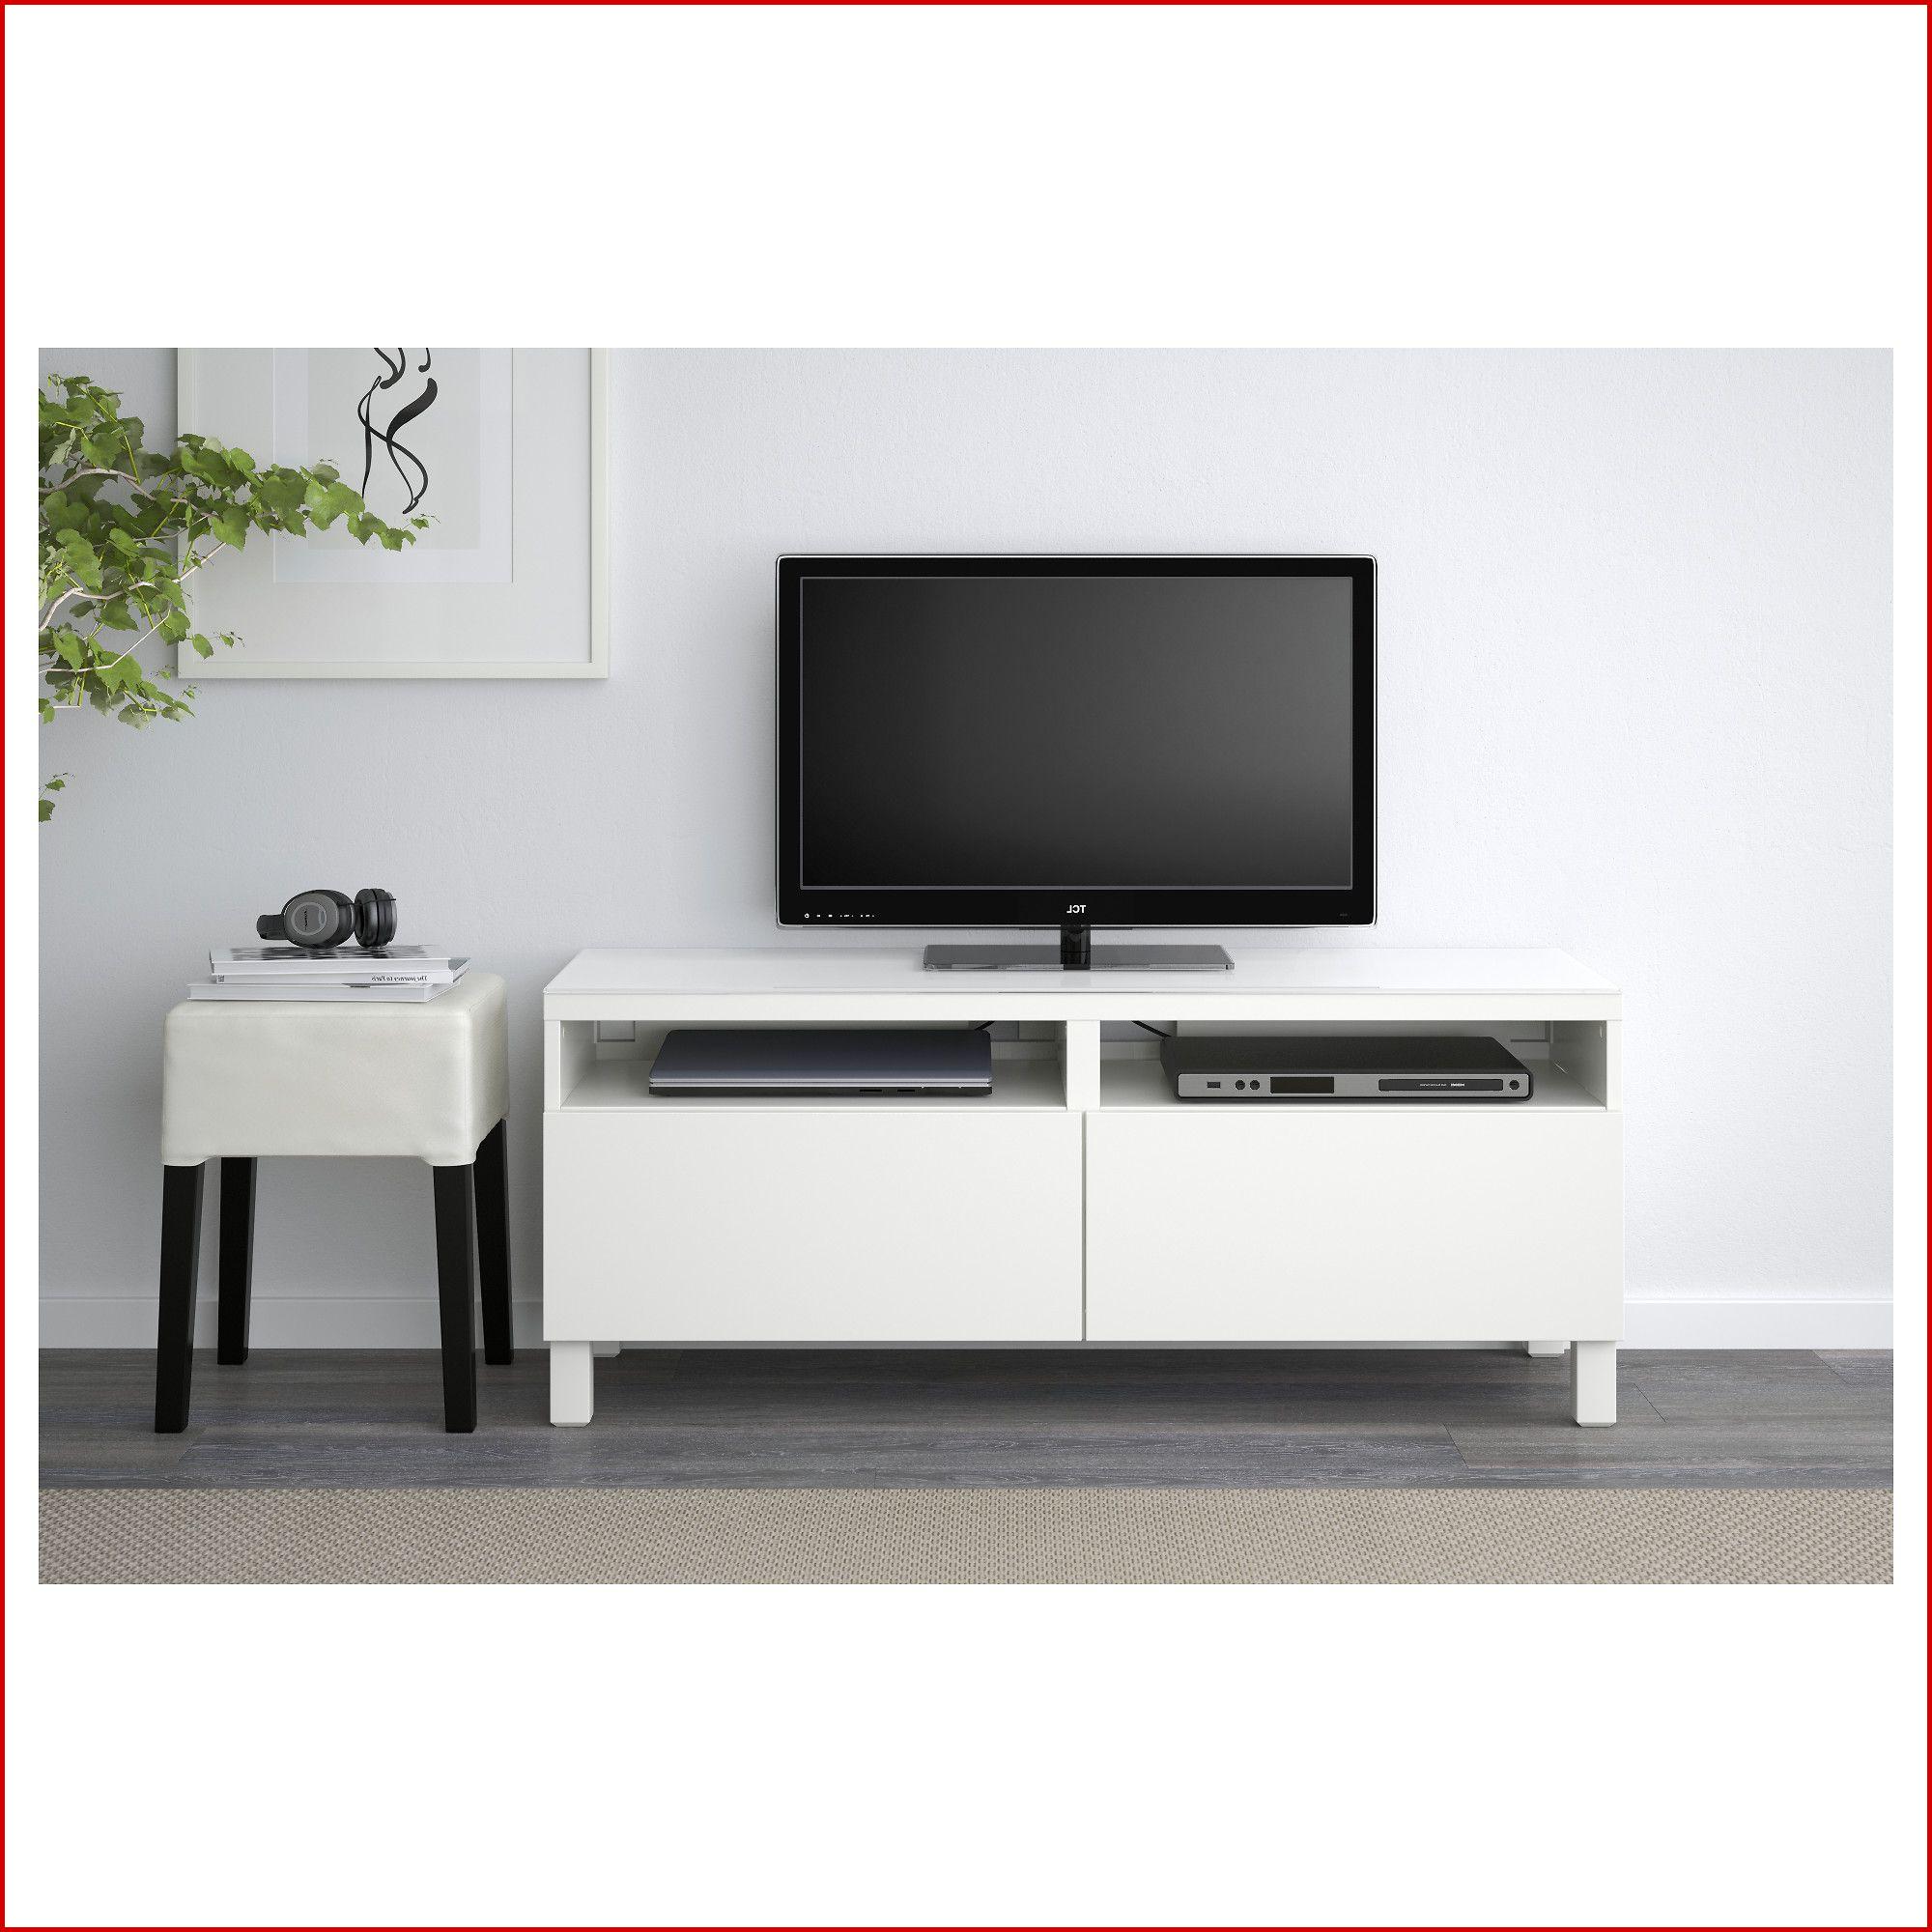 Mesas Tv Ikea 0gdr Ikea Mesa Tv Lack Furniture Ikea Tv Stand Design